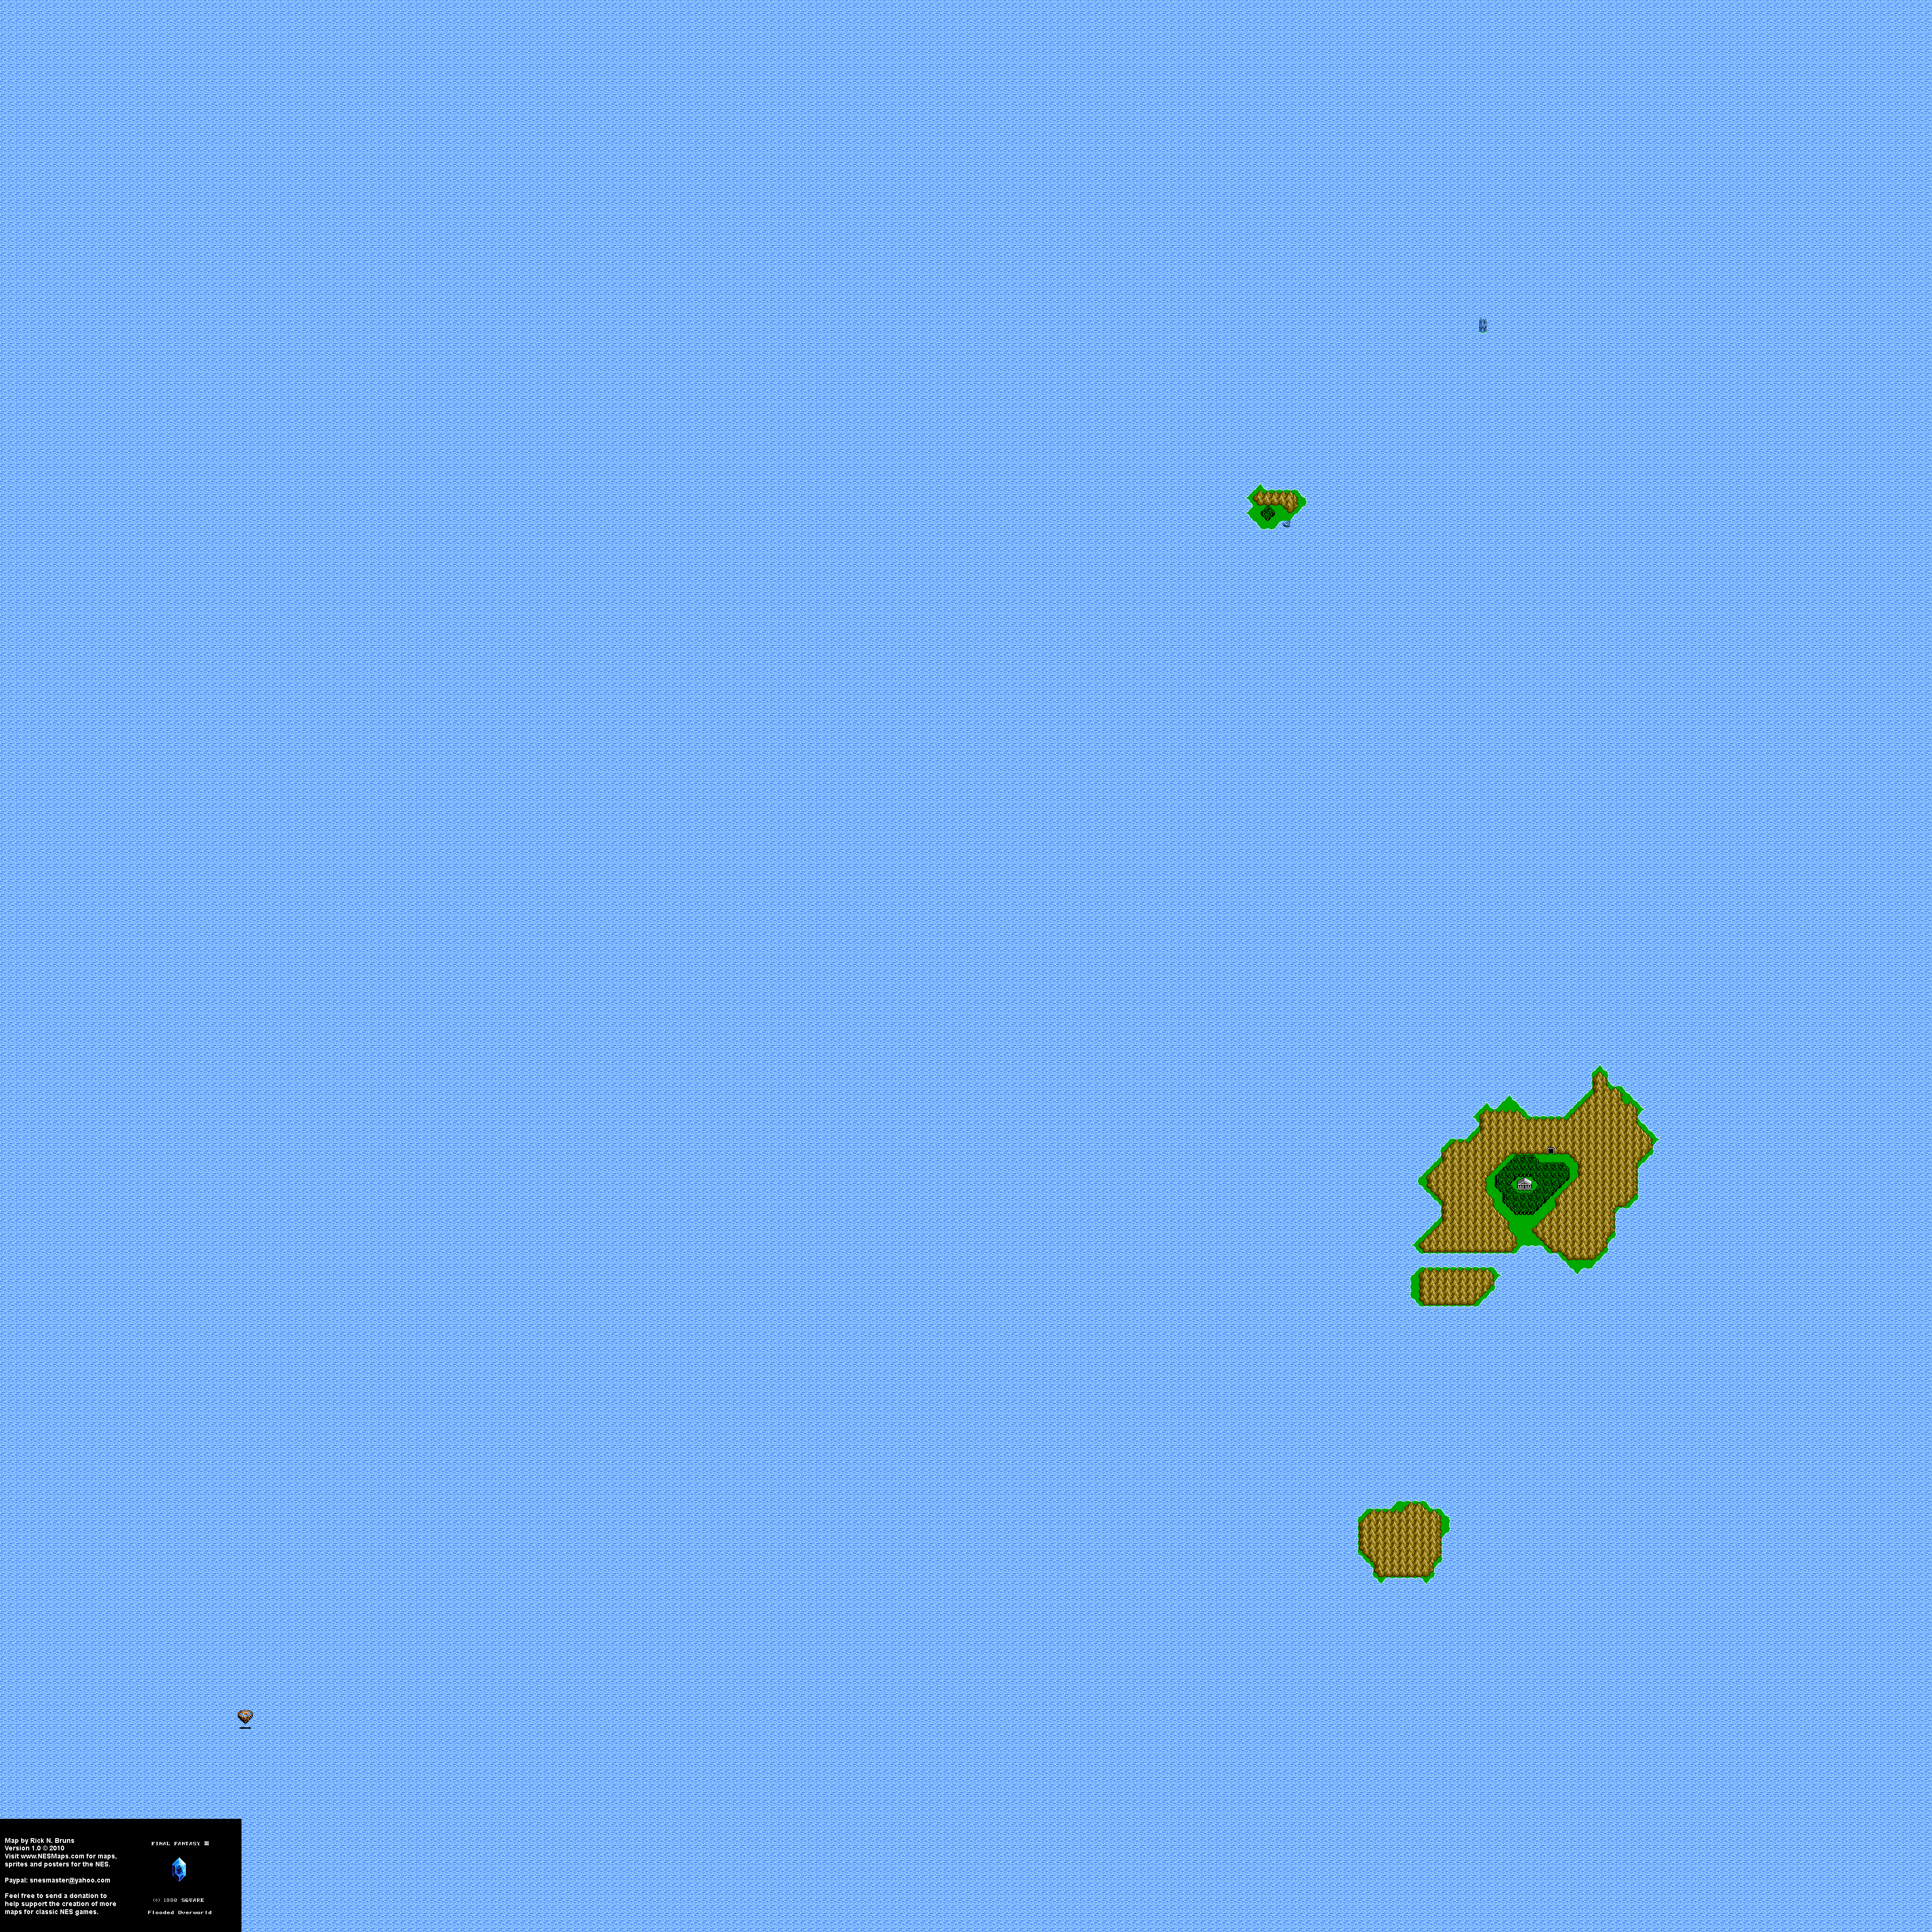 Final Fantasy III 3j - Flooded Continent Overworld Nintendo NES Map BG